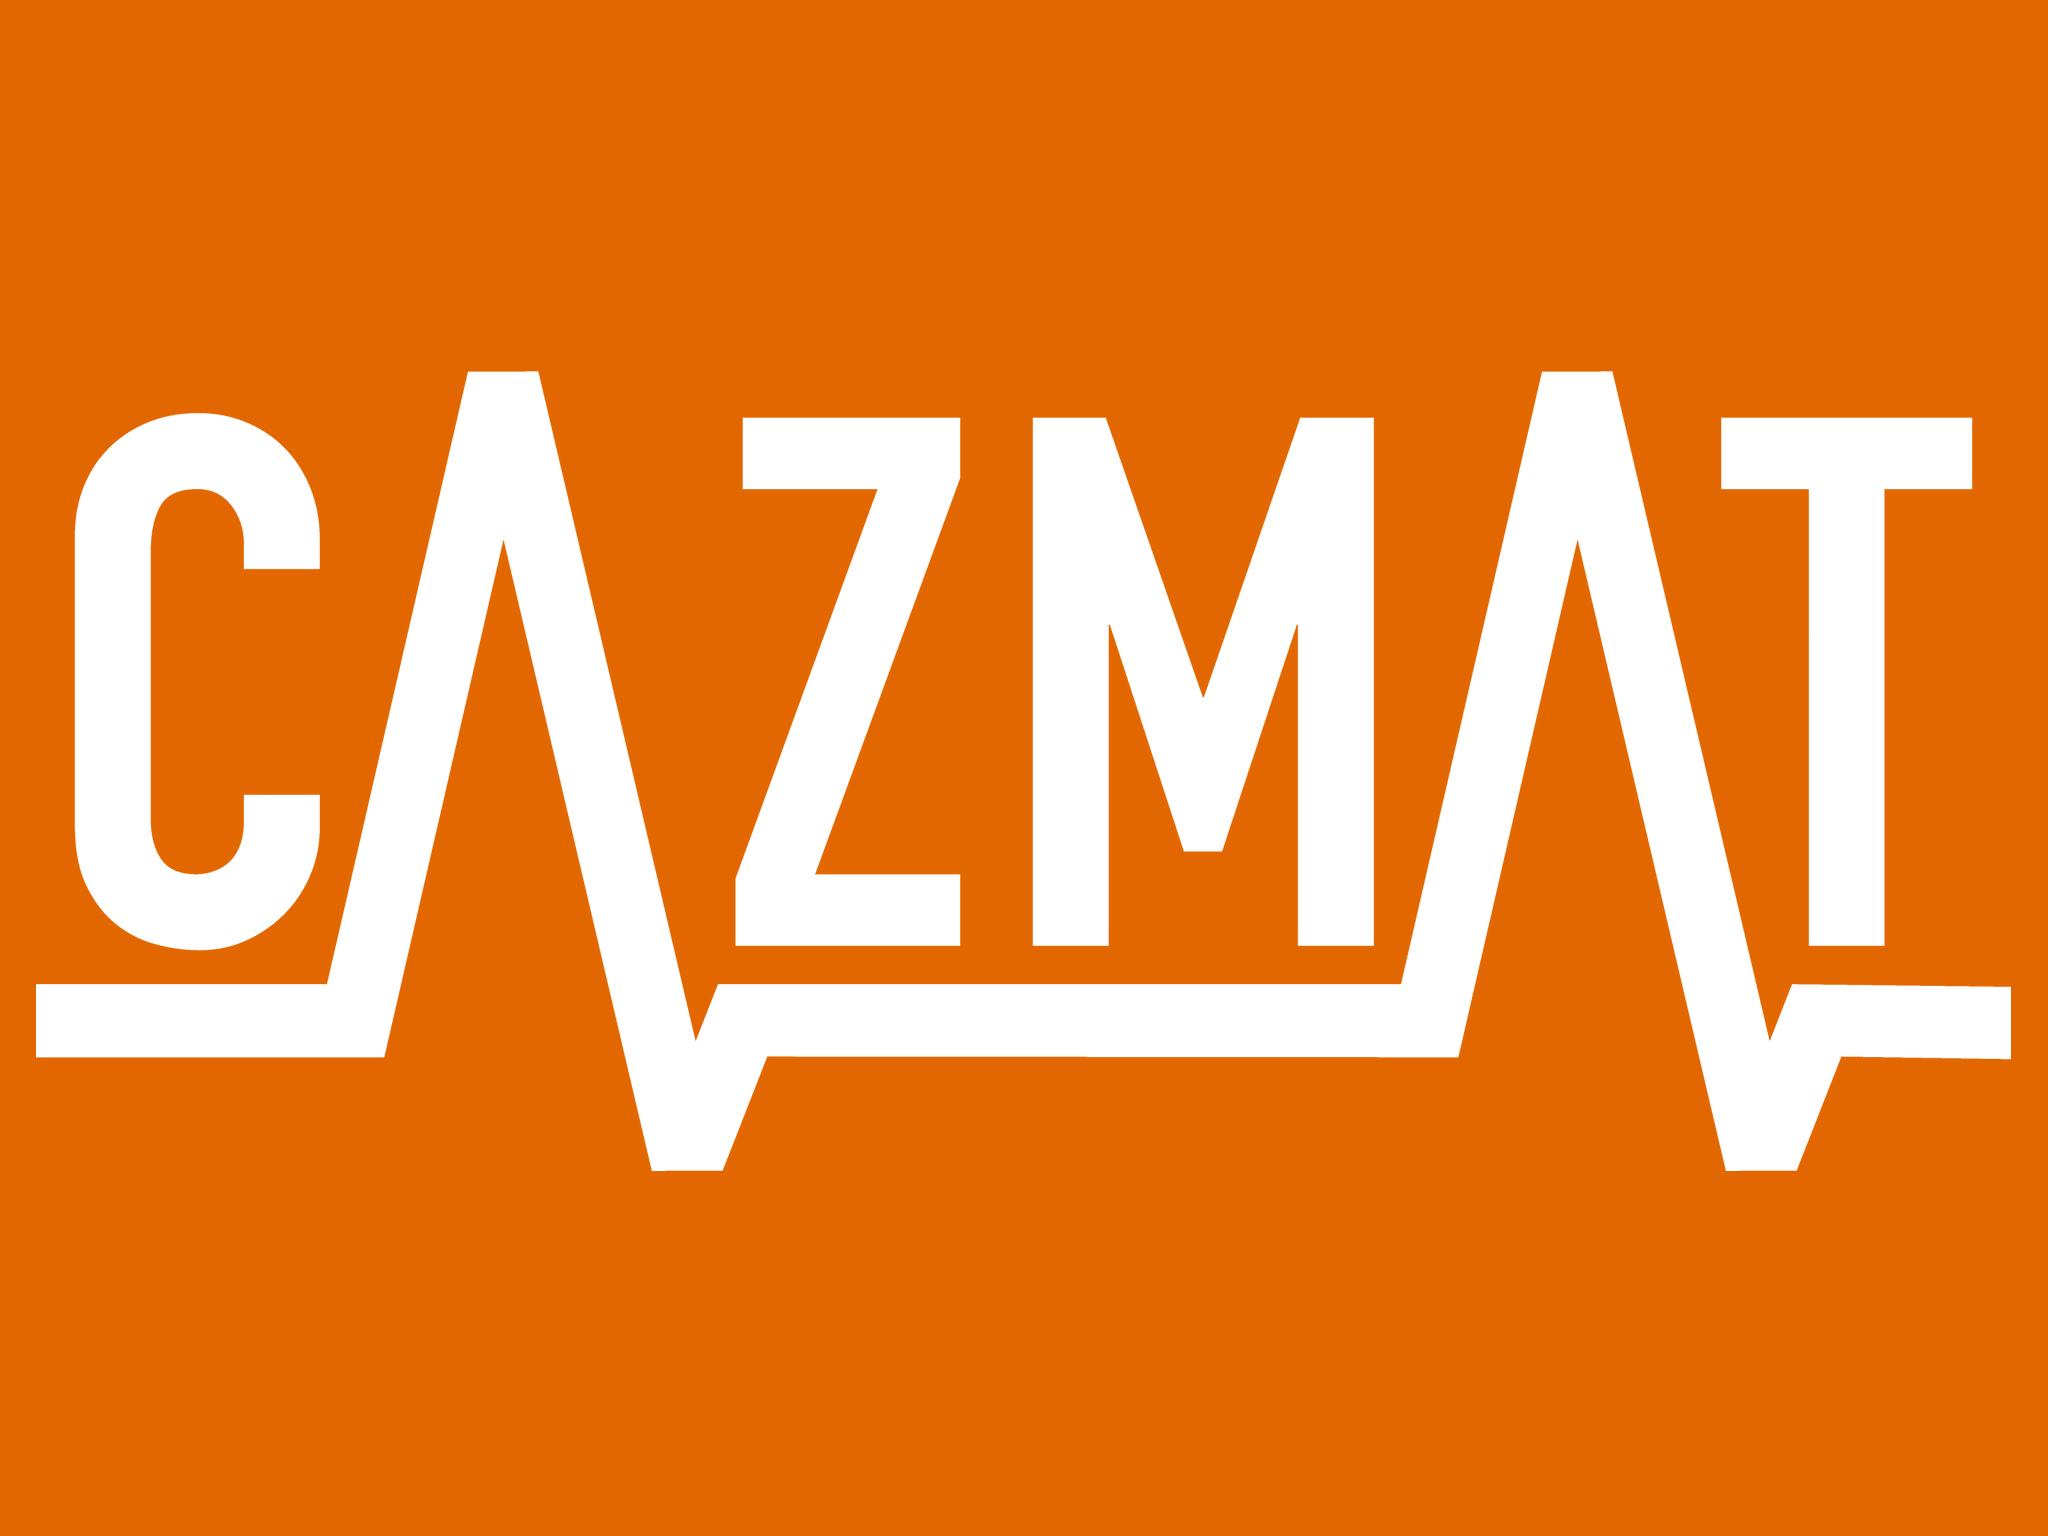 CAZMAT logo